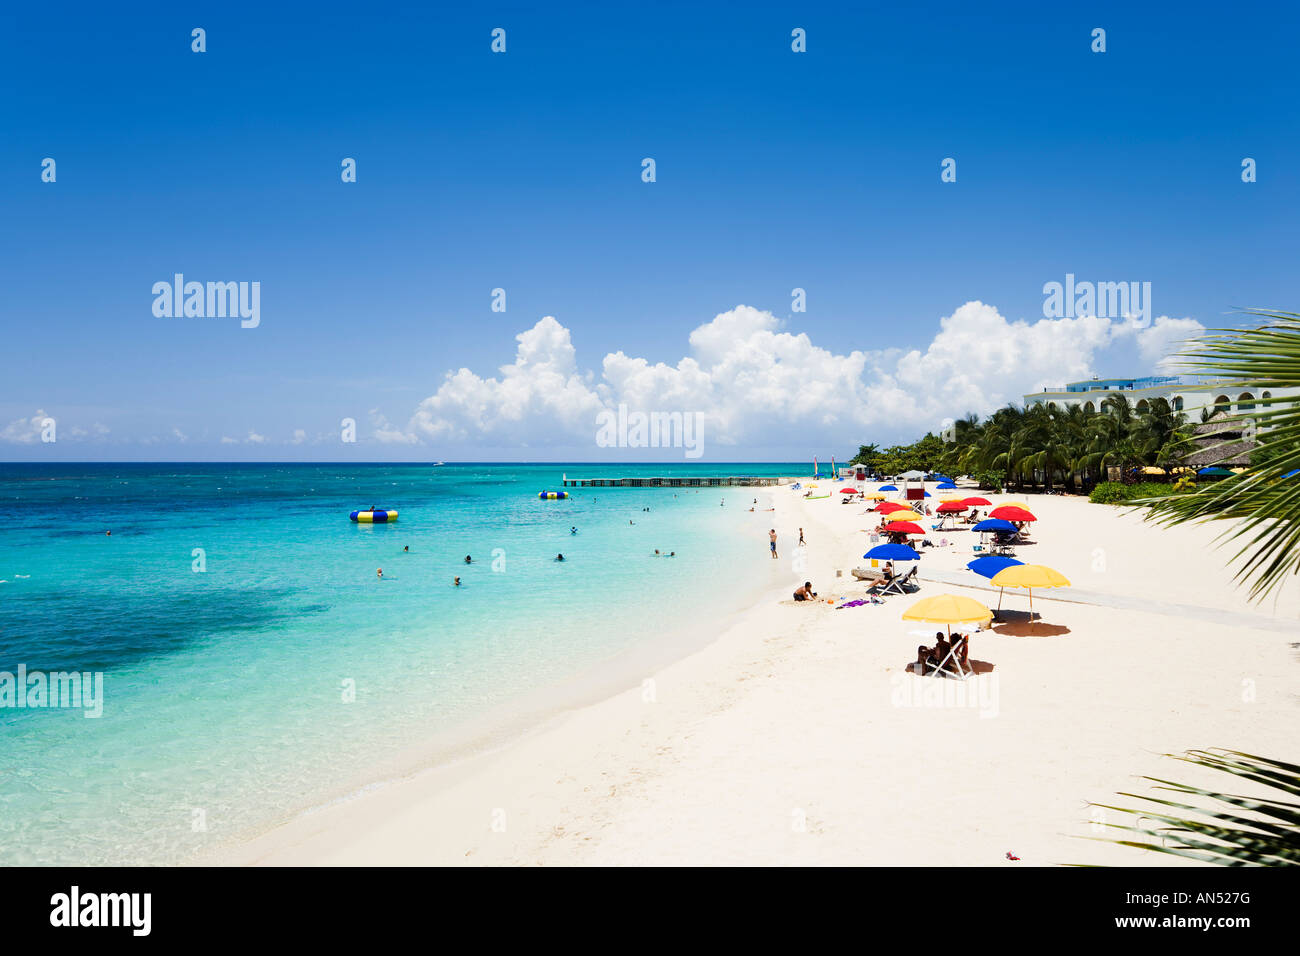 Doctor's Cave Beach, North Coast, Montego Bay, Jamaica, Caribbean - Stock Image